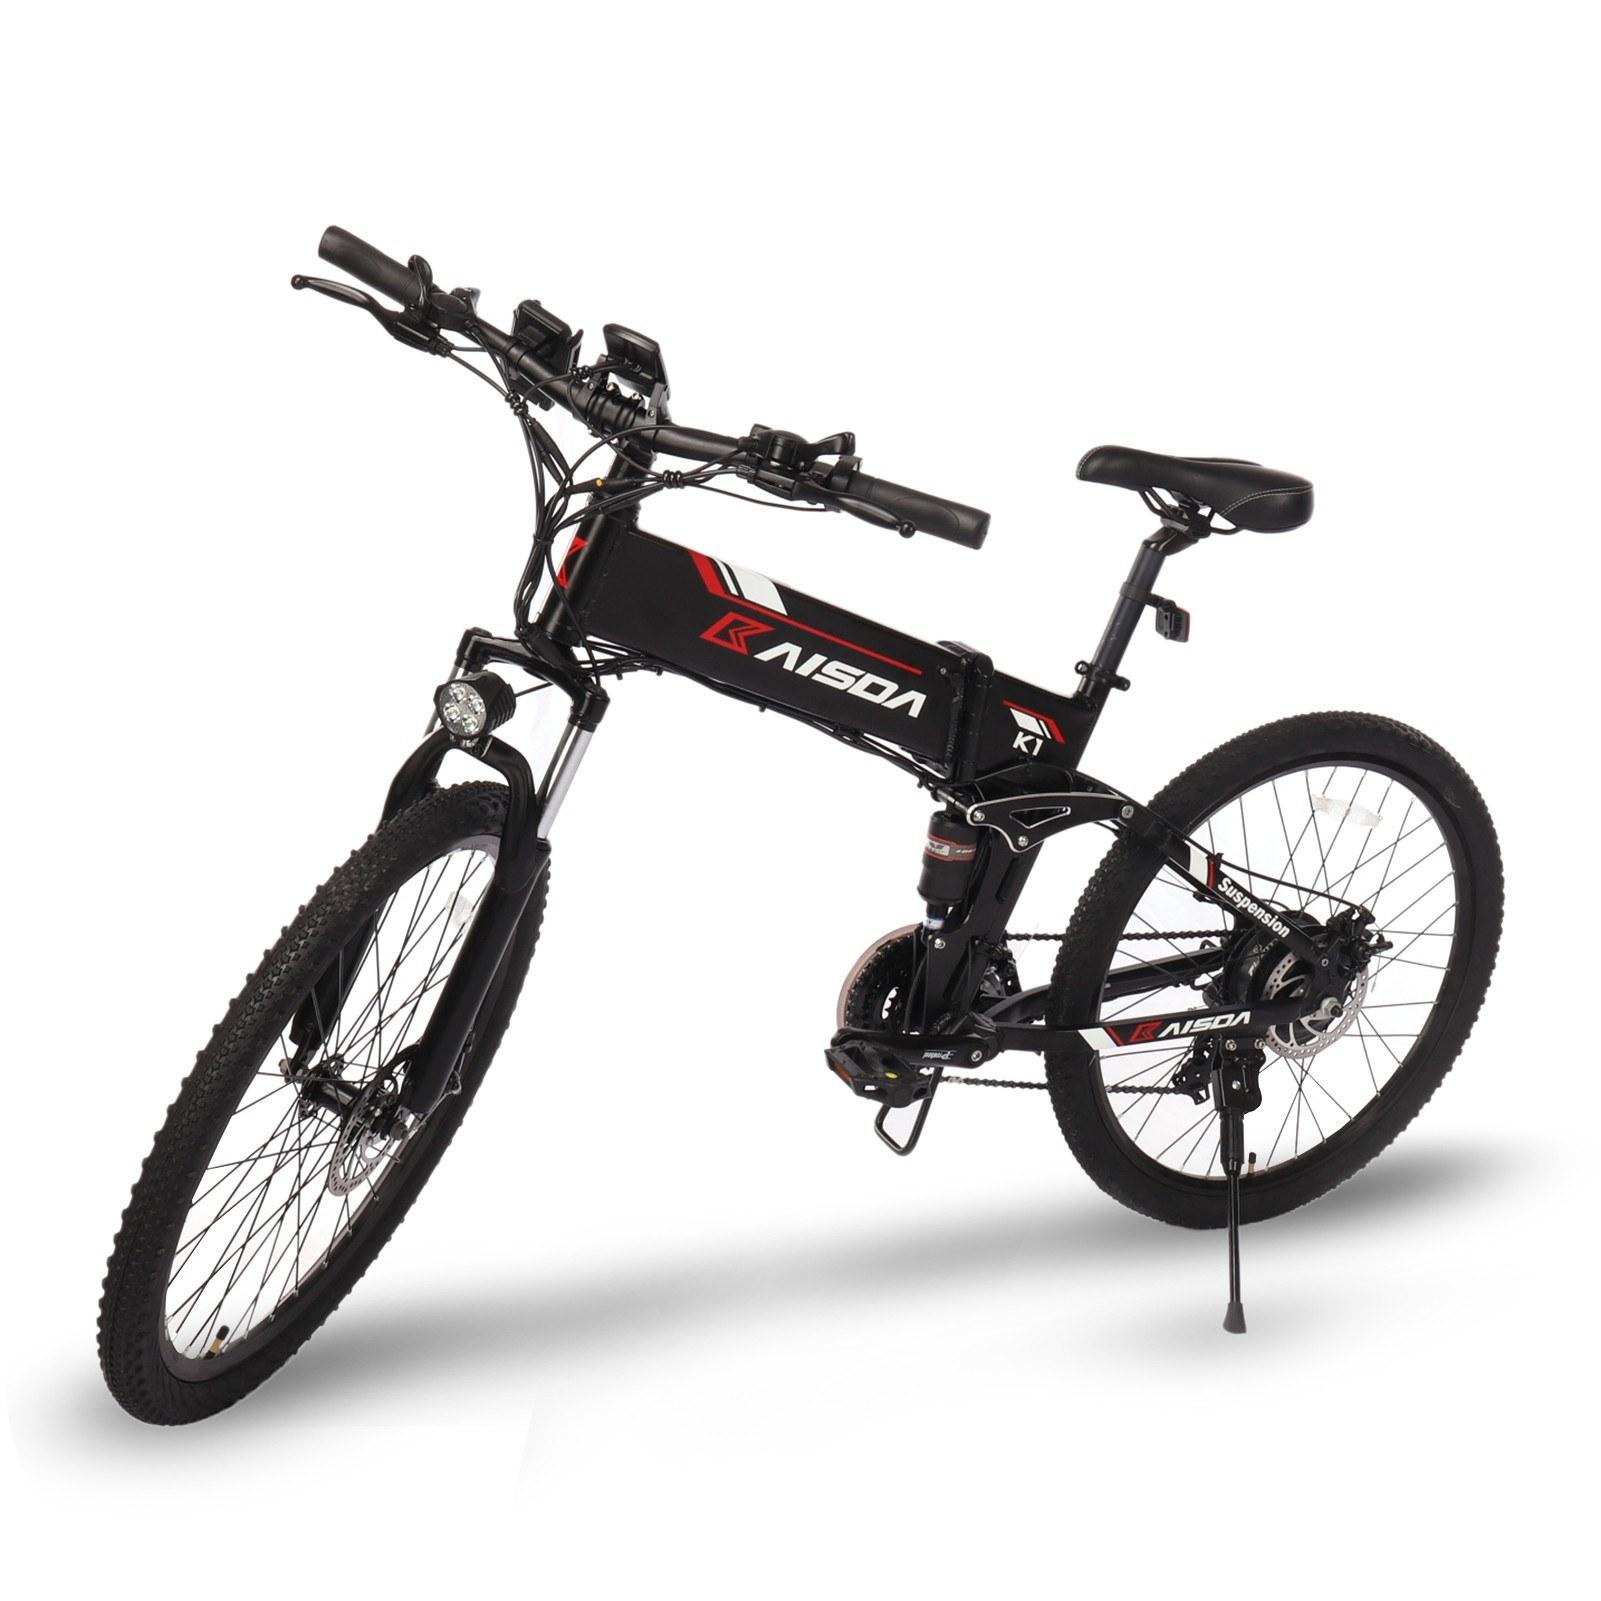 tomtop.com - [EU Warehouse] 45% OFF KAISDA K1 26 Inch Folding Electric Bike 48V 10.4AH 500W, $1038.81 (Inclusive of VAT)